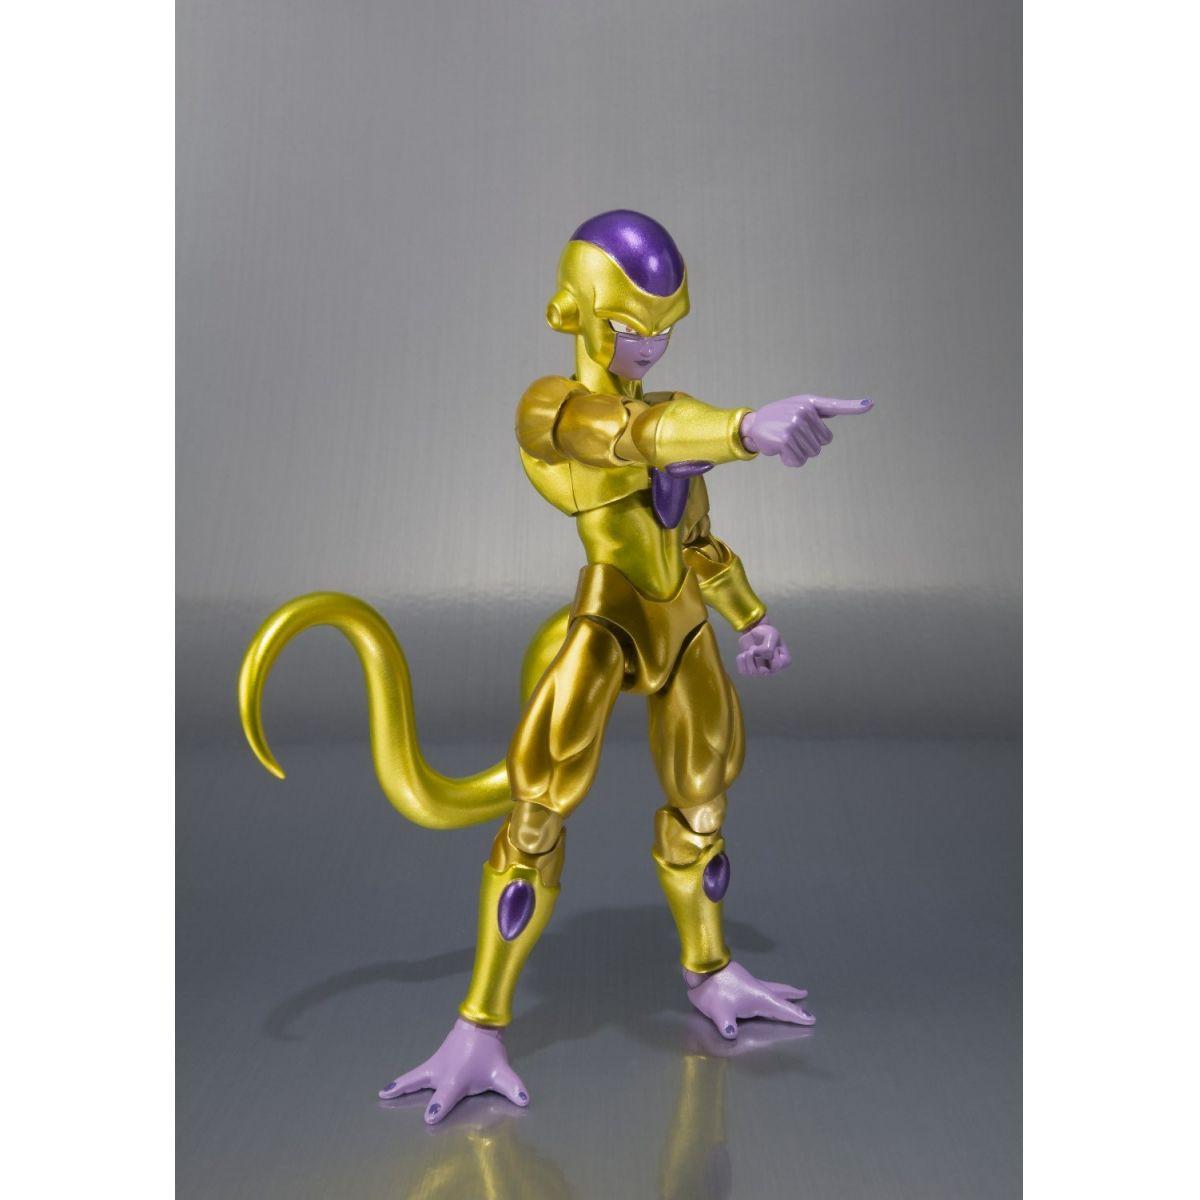 Dragon Ball Z Golden Frieza S.H Figuarts - Bandai